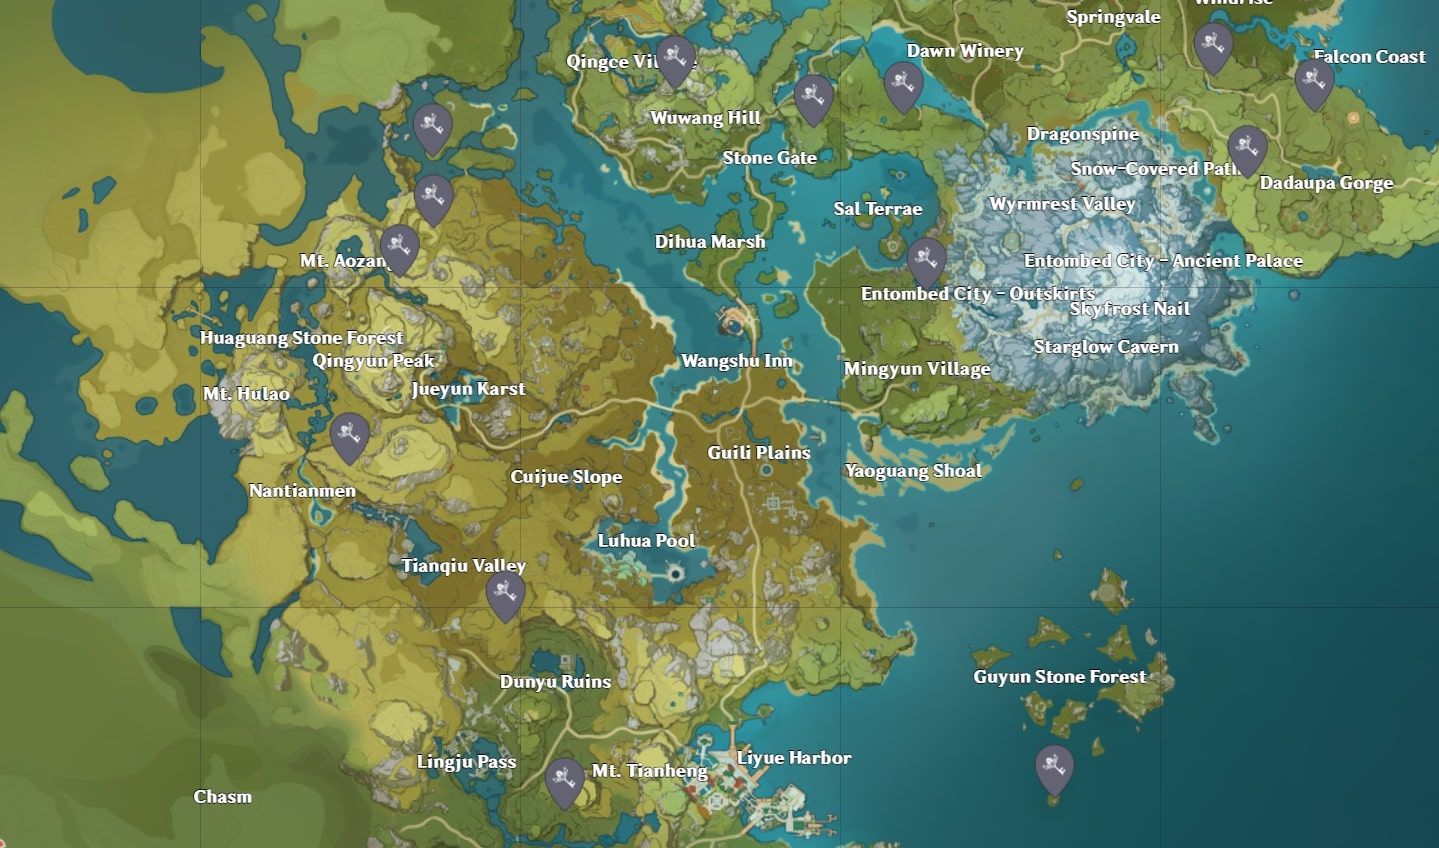 Mapa del Santuario Profundo de Liyue de Genshin Impact